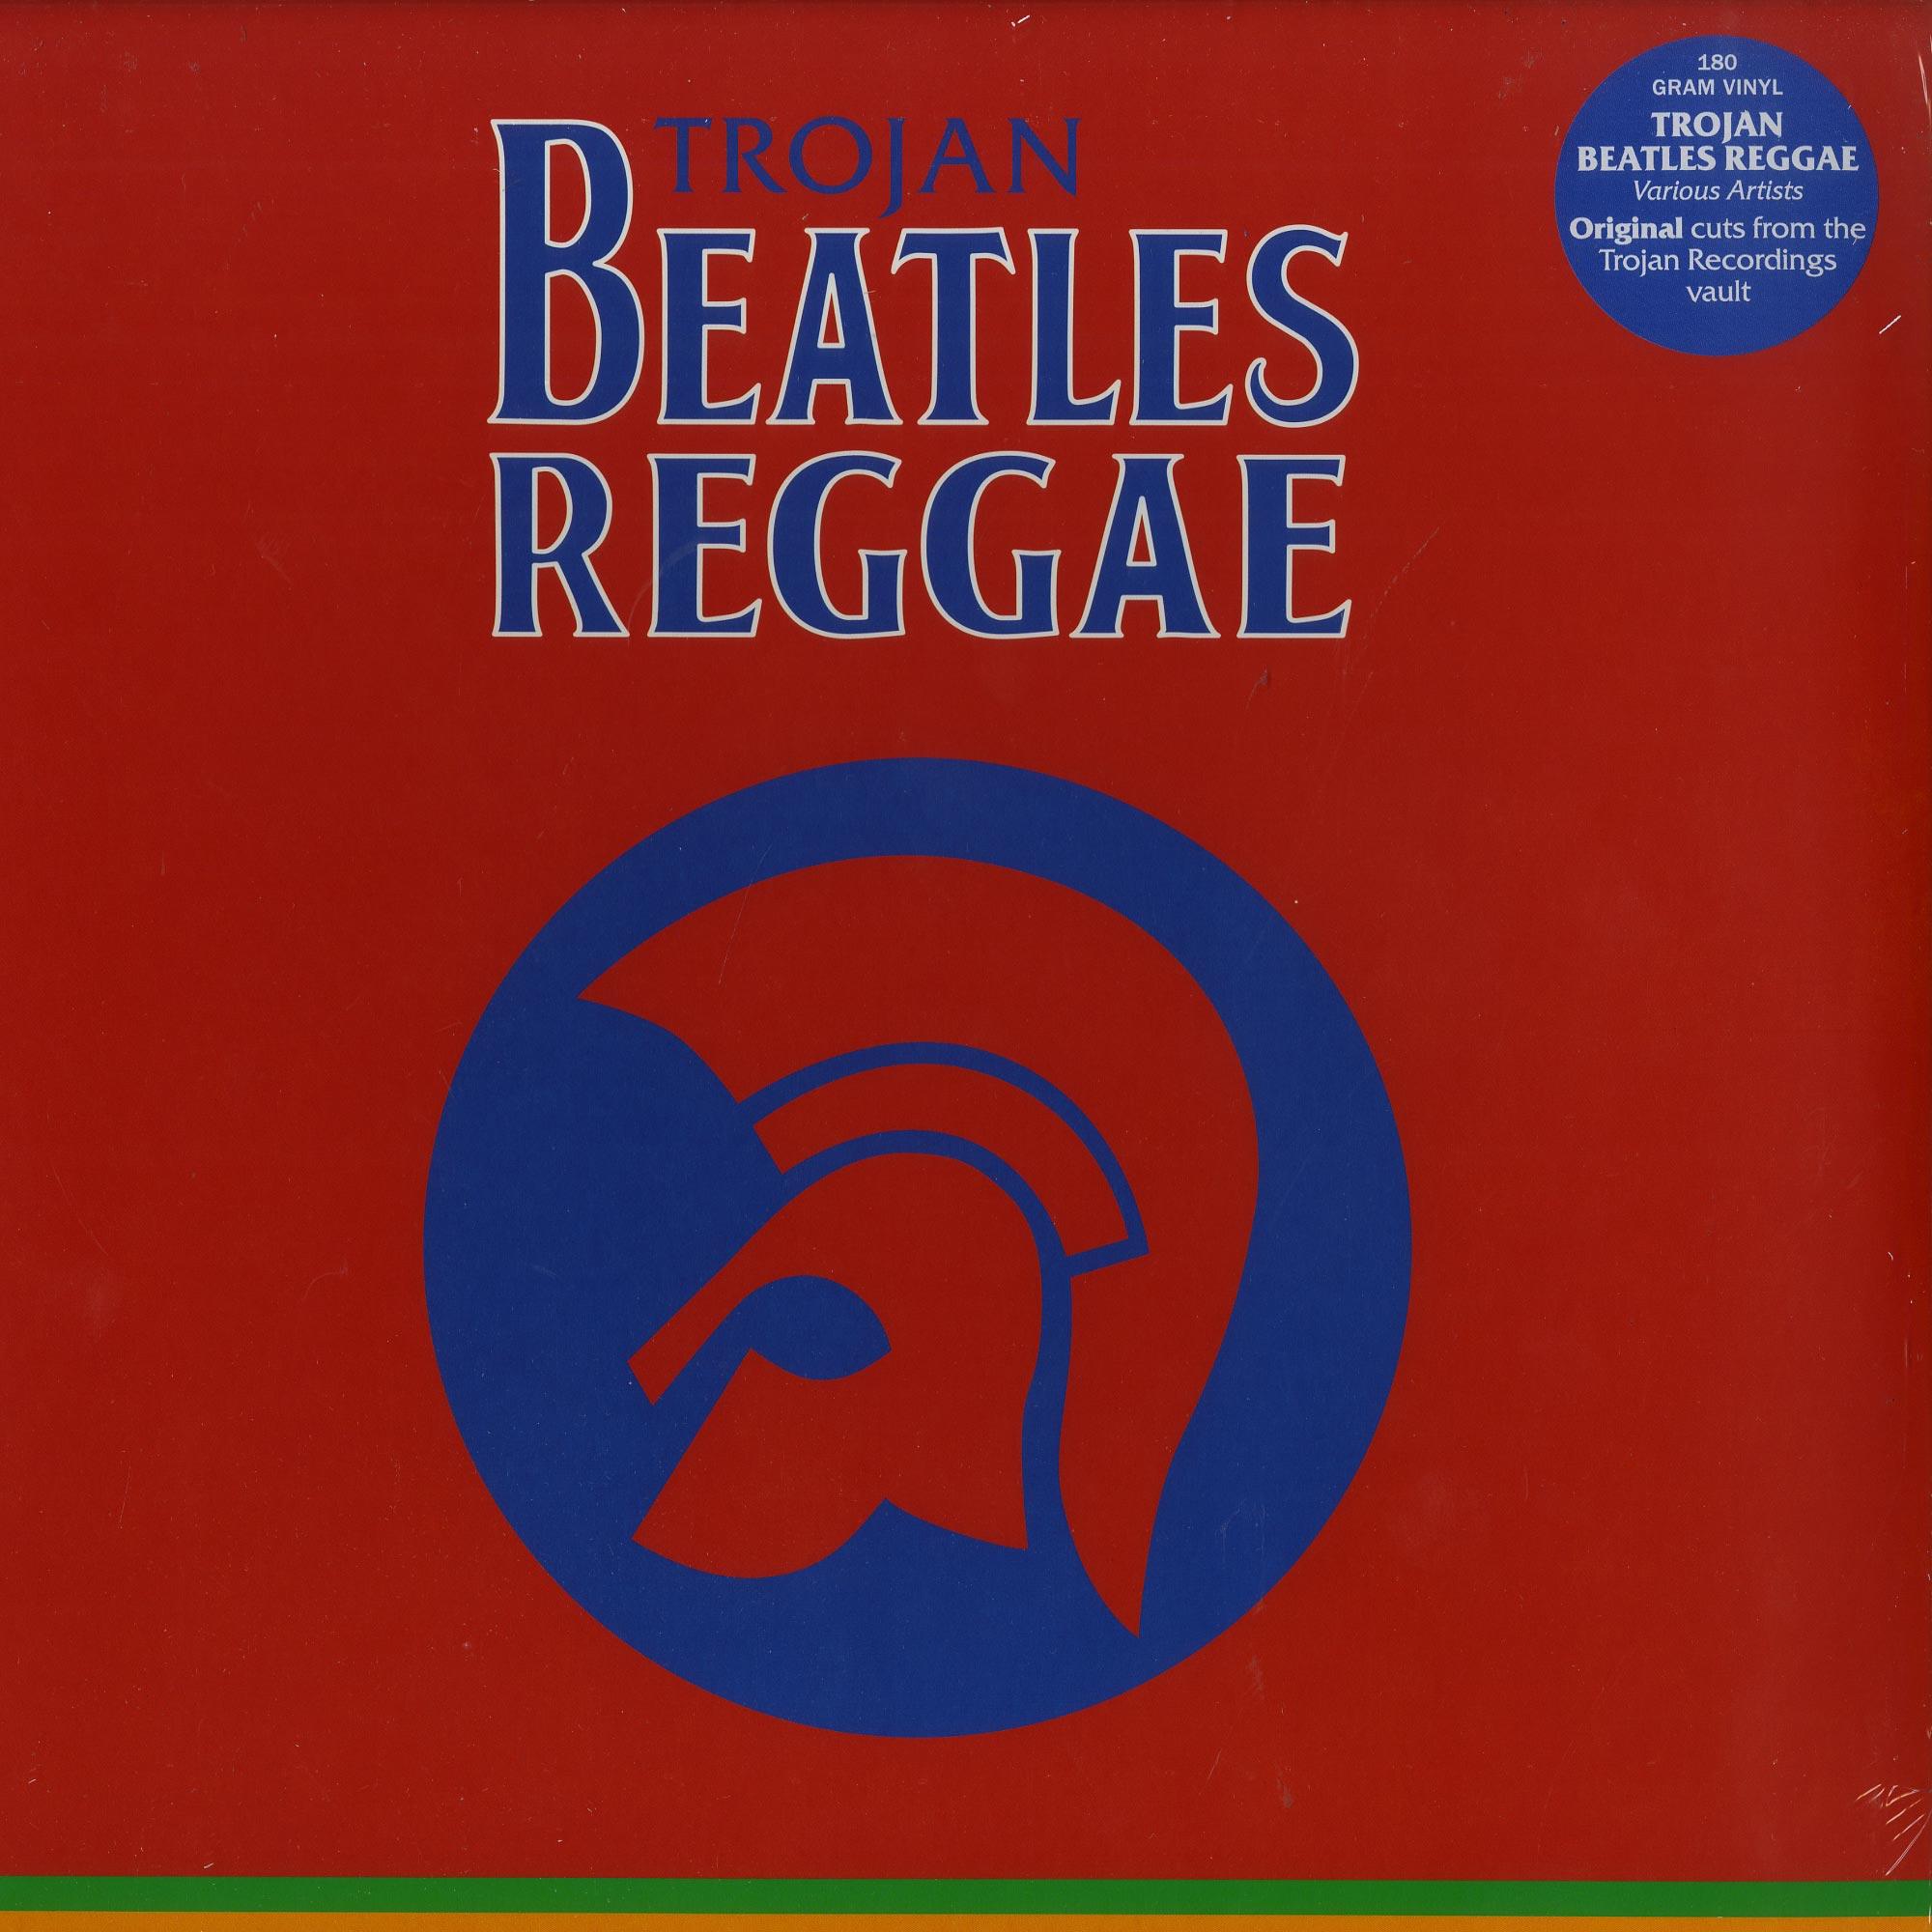 Various Artists - TROJAN BEATLES REGGAE - THE RED ALBUM